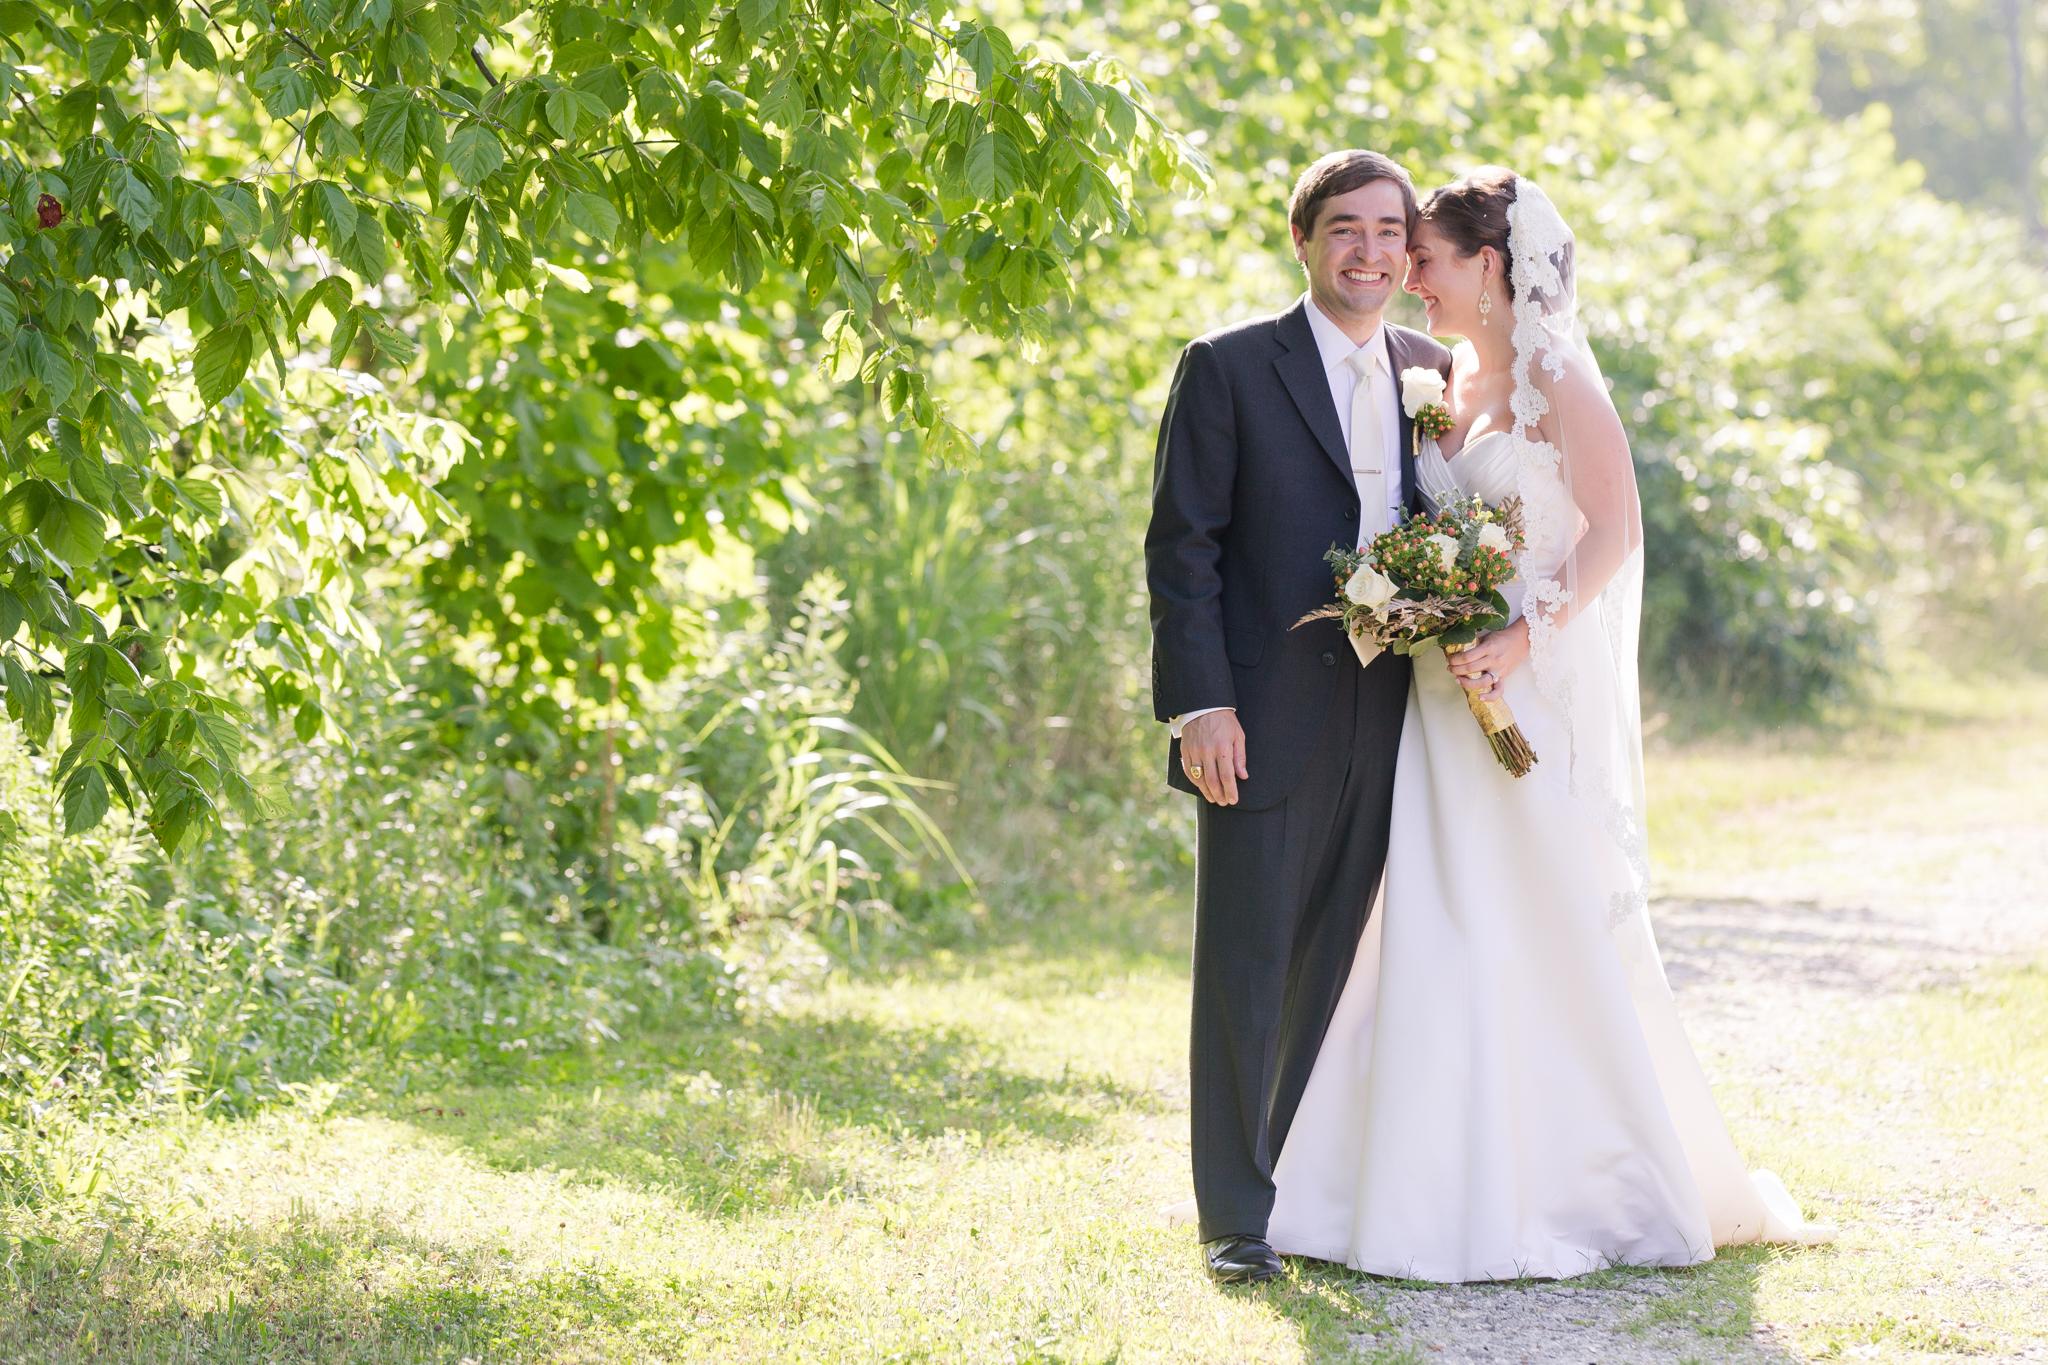 Ashley-Amber-Photo-Outdoor-Wedding-Photography-173444.jpg